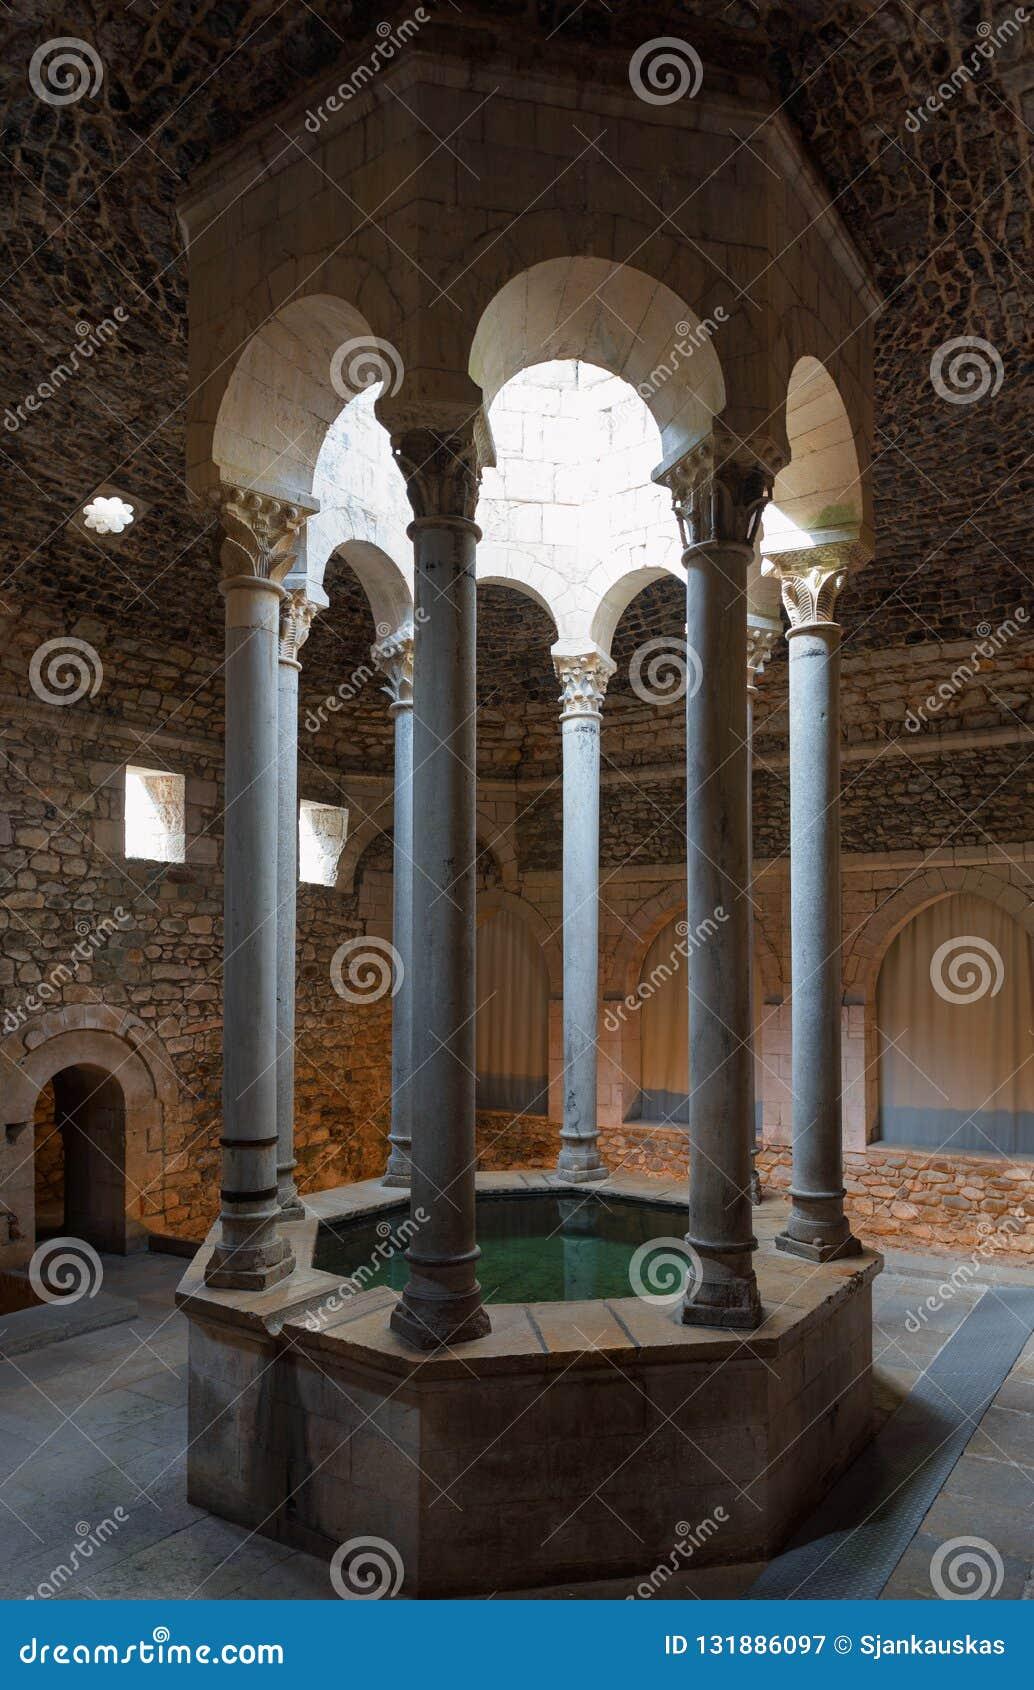 Baños Arabes Girona | Piscina Arabe De Los Banos En Girona Cataluna Espana Imagen De